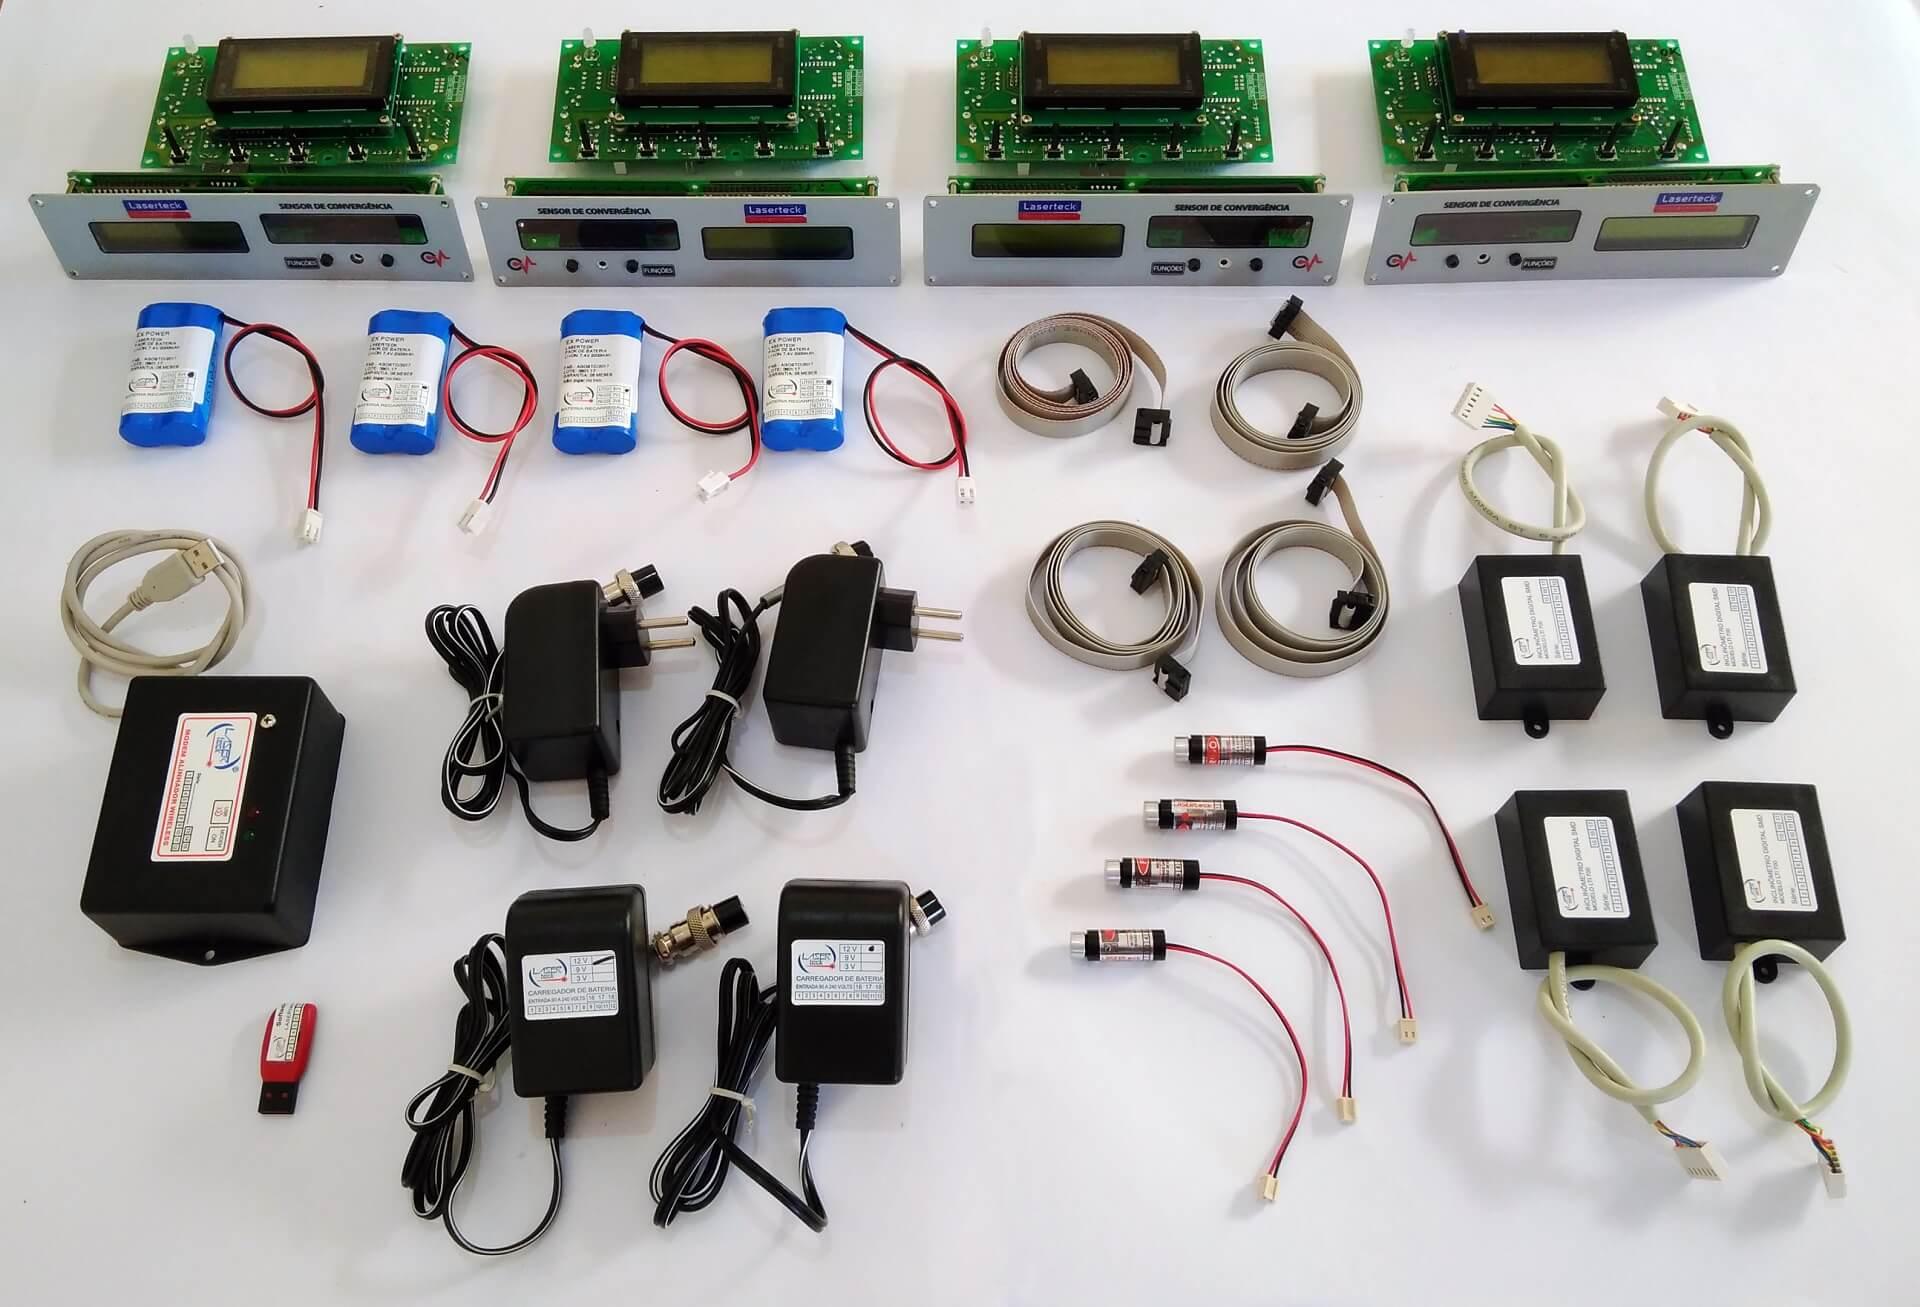 Kit-Alinhador Computadorizado/Wifi LTA 850-4